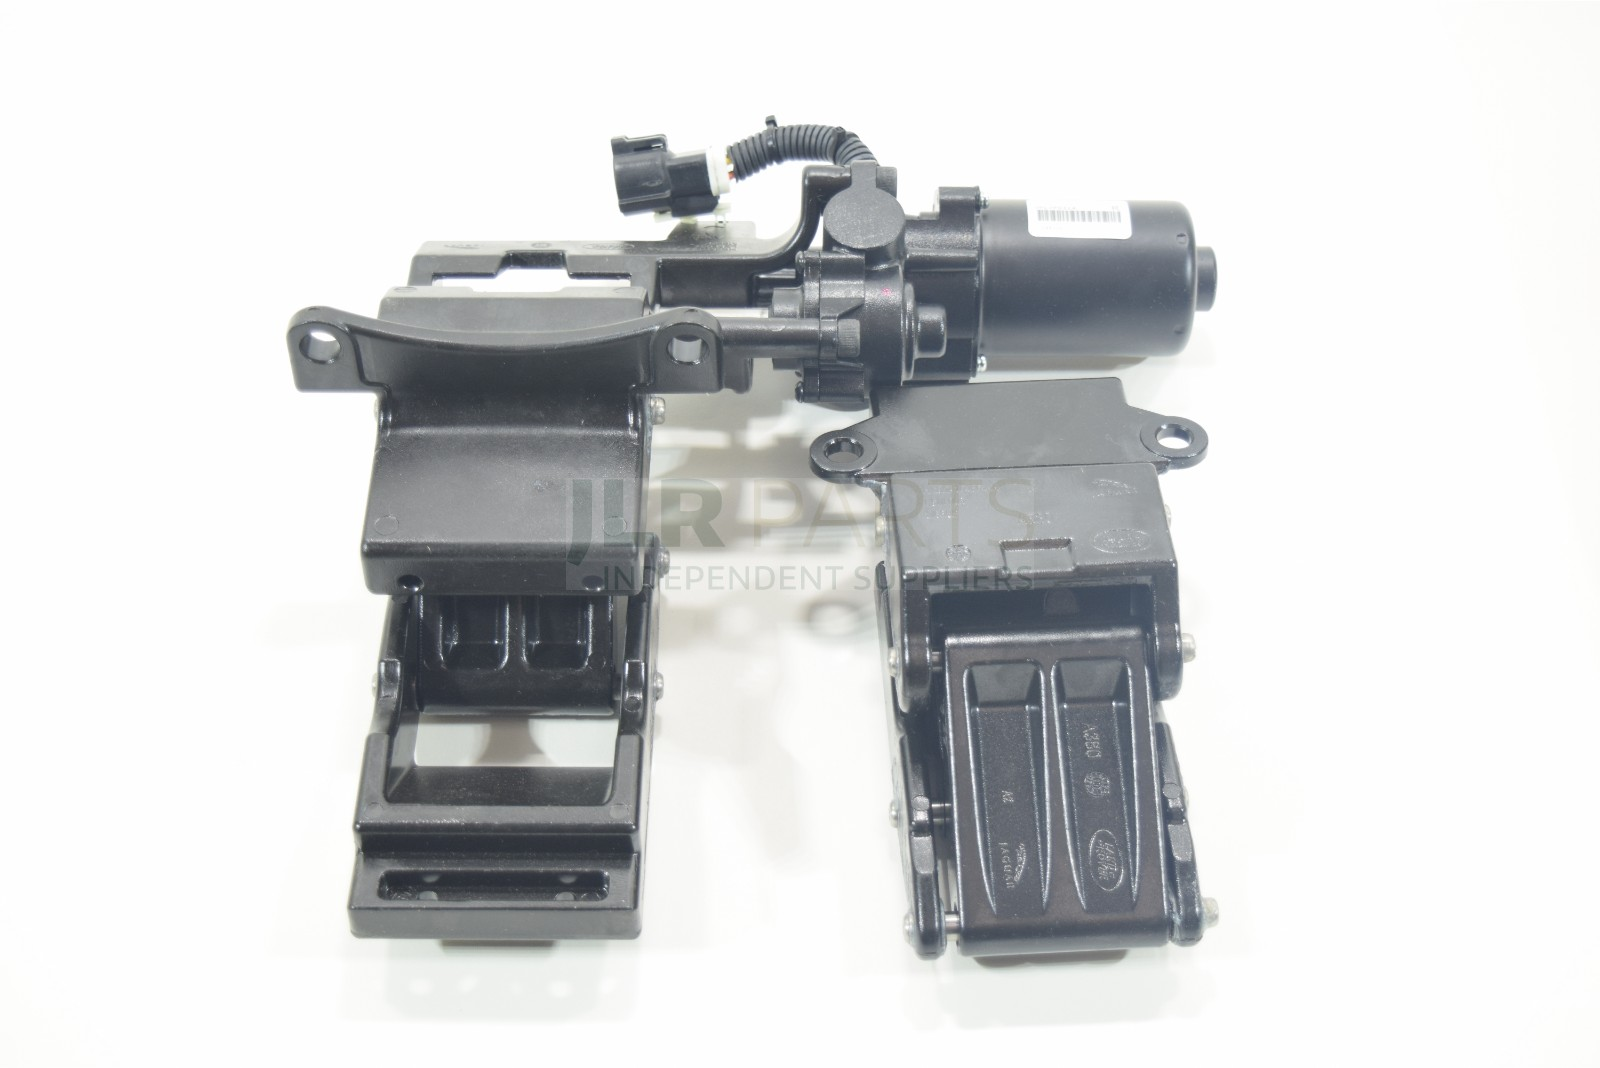 Deployed Side Steps For Range Rover Genuine Accessory: VPLYP0324